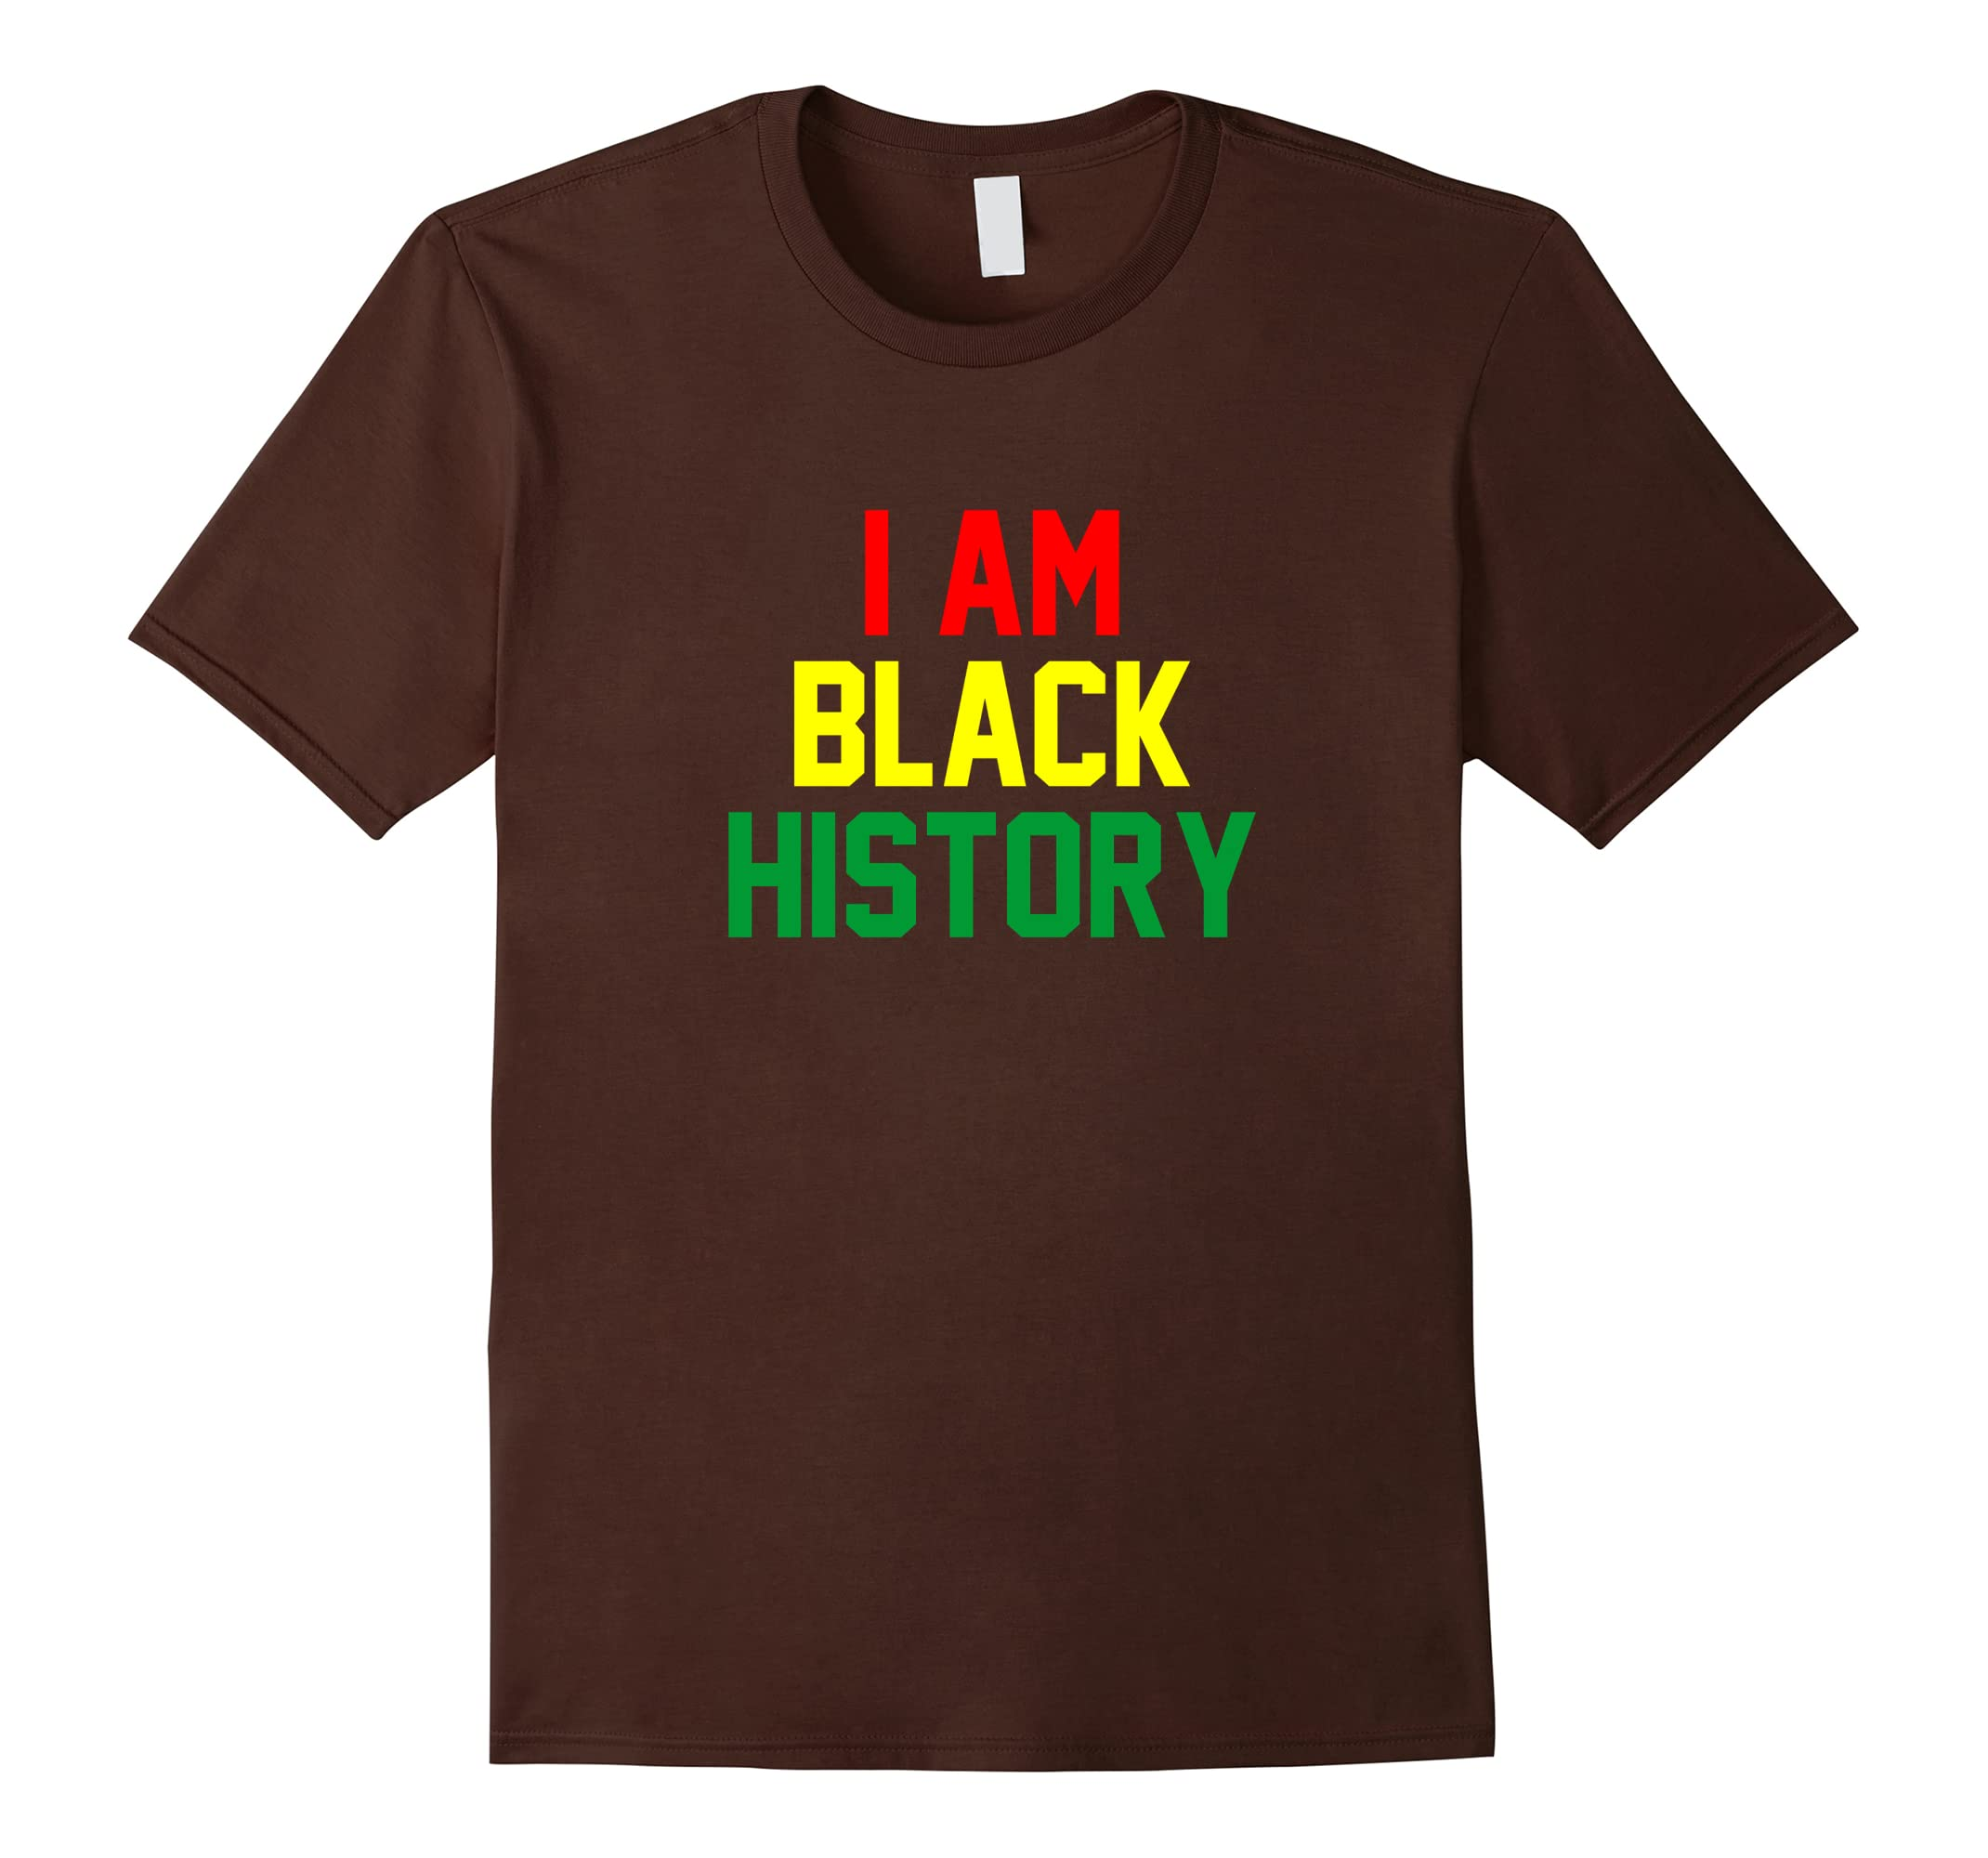 Am Black History Trendy T Shirt-Tovacu